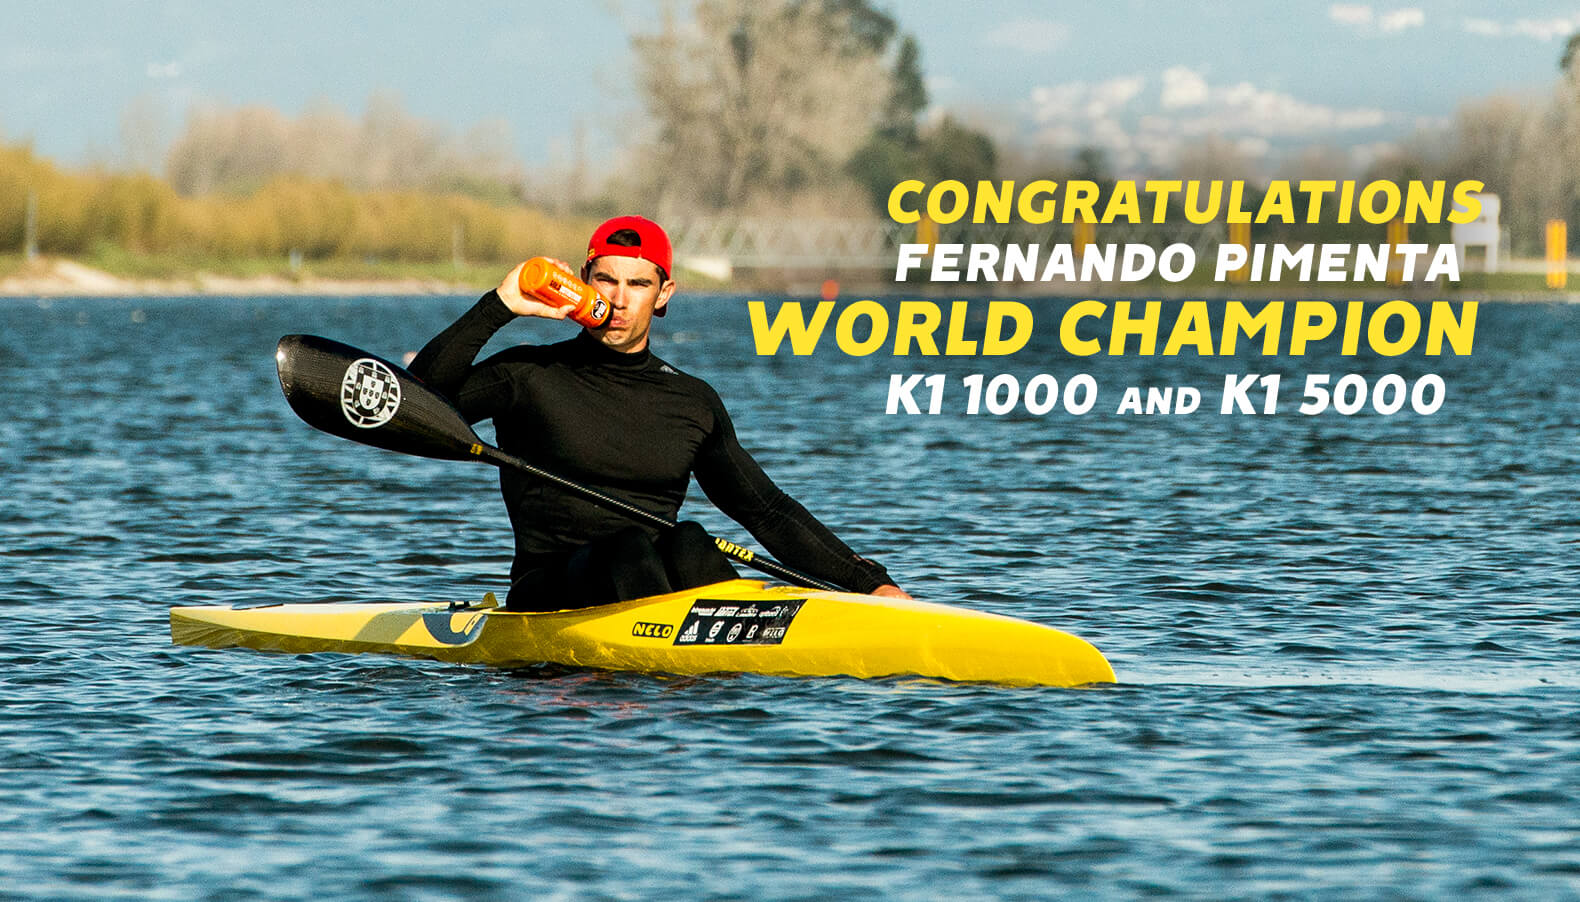 Fernando Pimenta World Champion Canoing